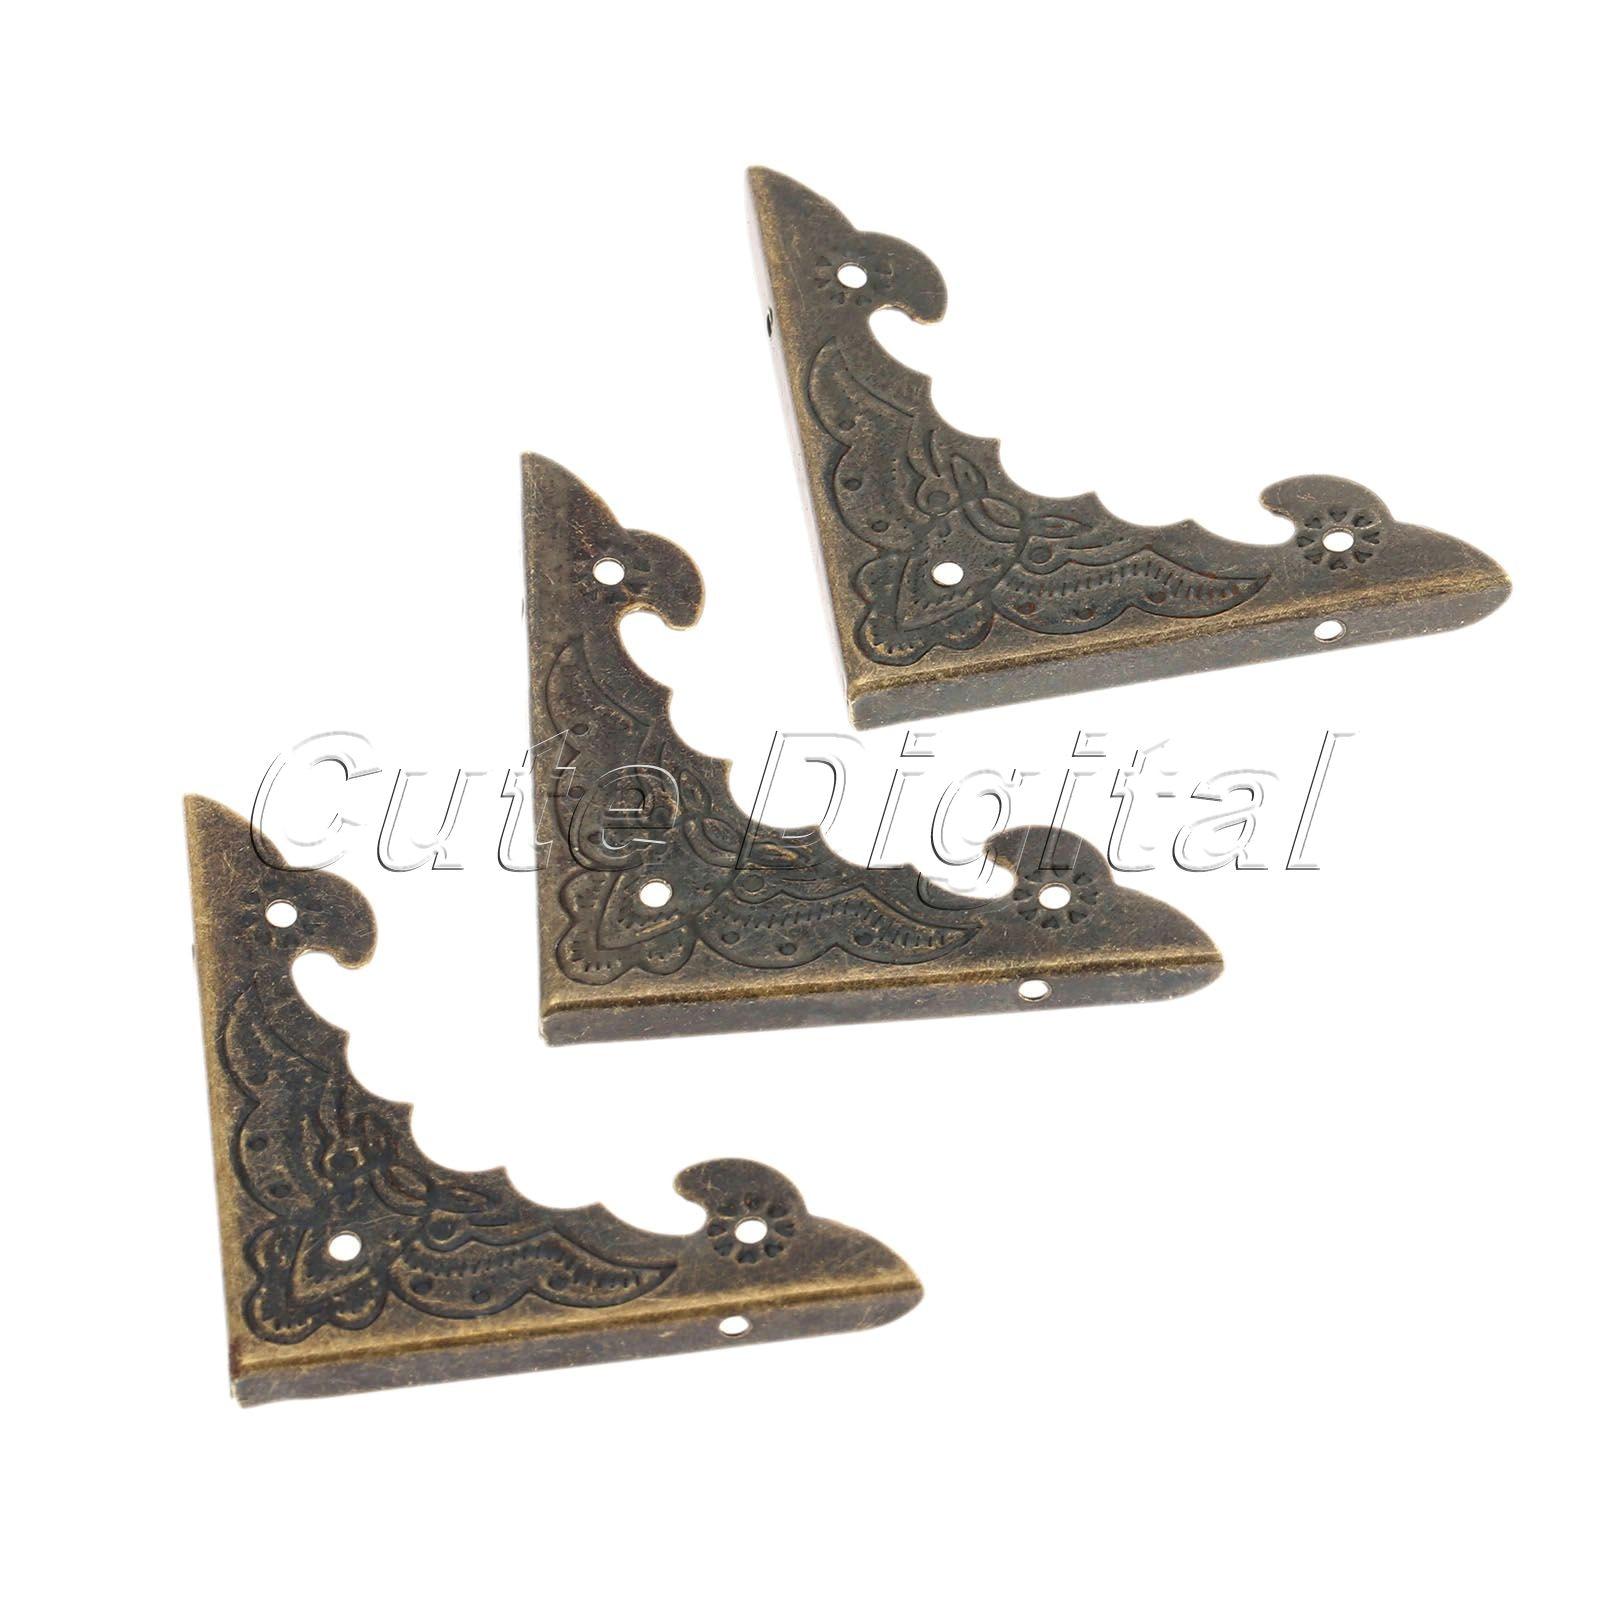 12pcs Bronze/Golden Metal Book Scrapbooking Albums Menus Folder Corner Protector Wooden Jewelry Box Decorative Corners Bracket golden bronze sparkle